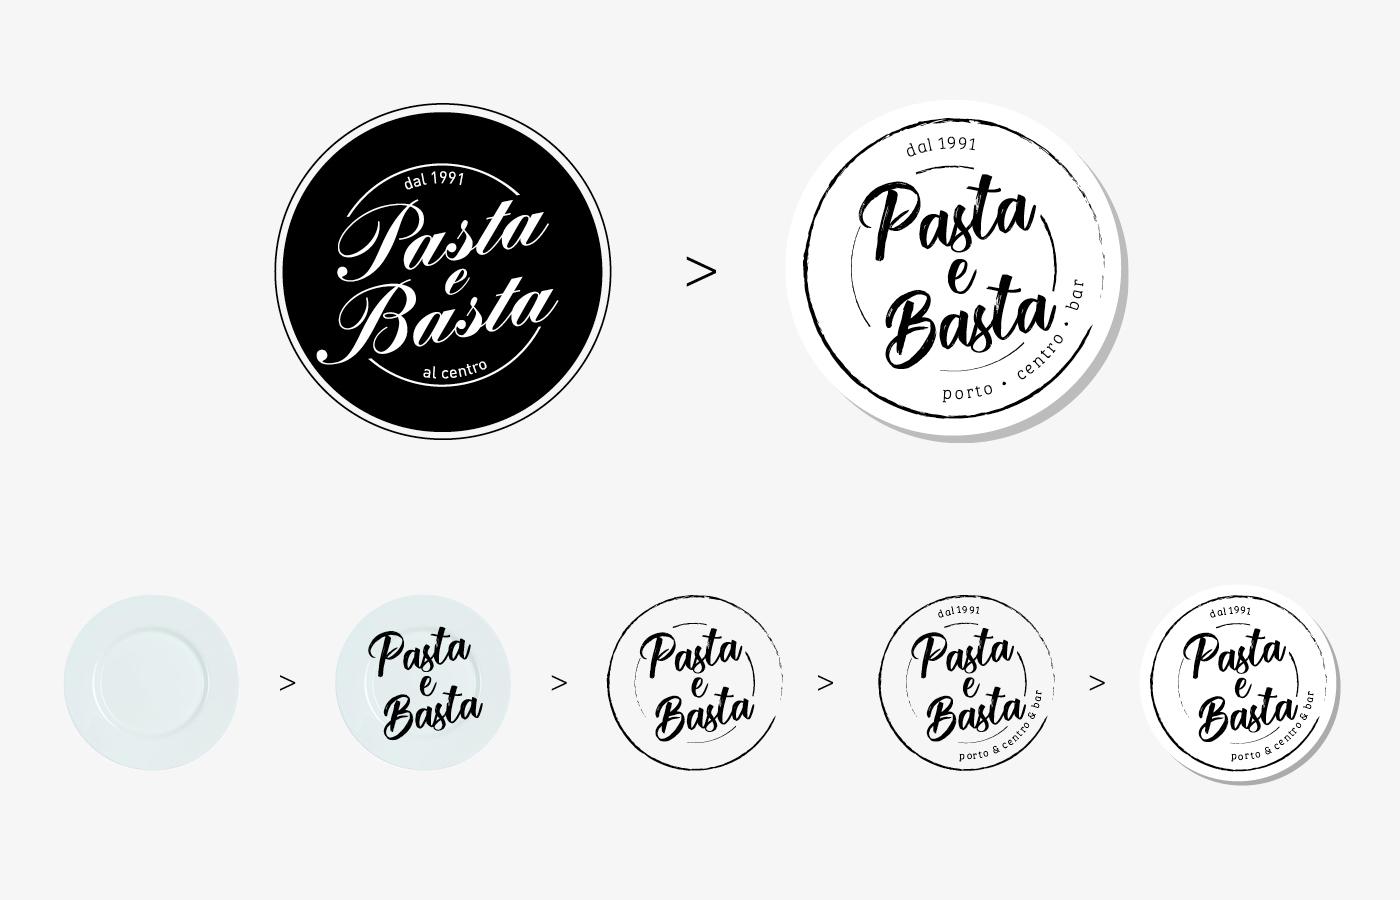 pasta_e_basta_logo_1.jpg